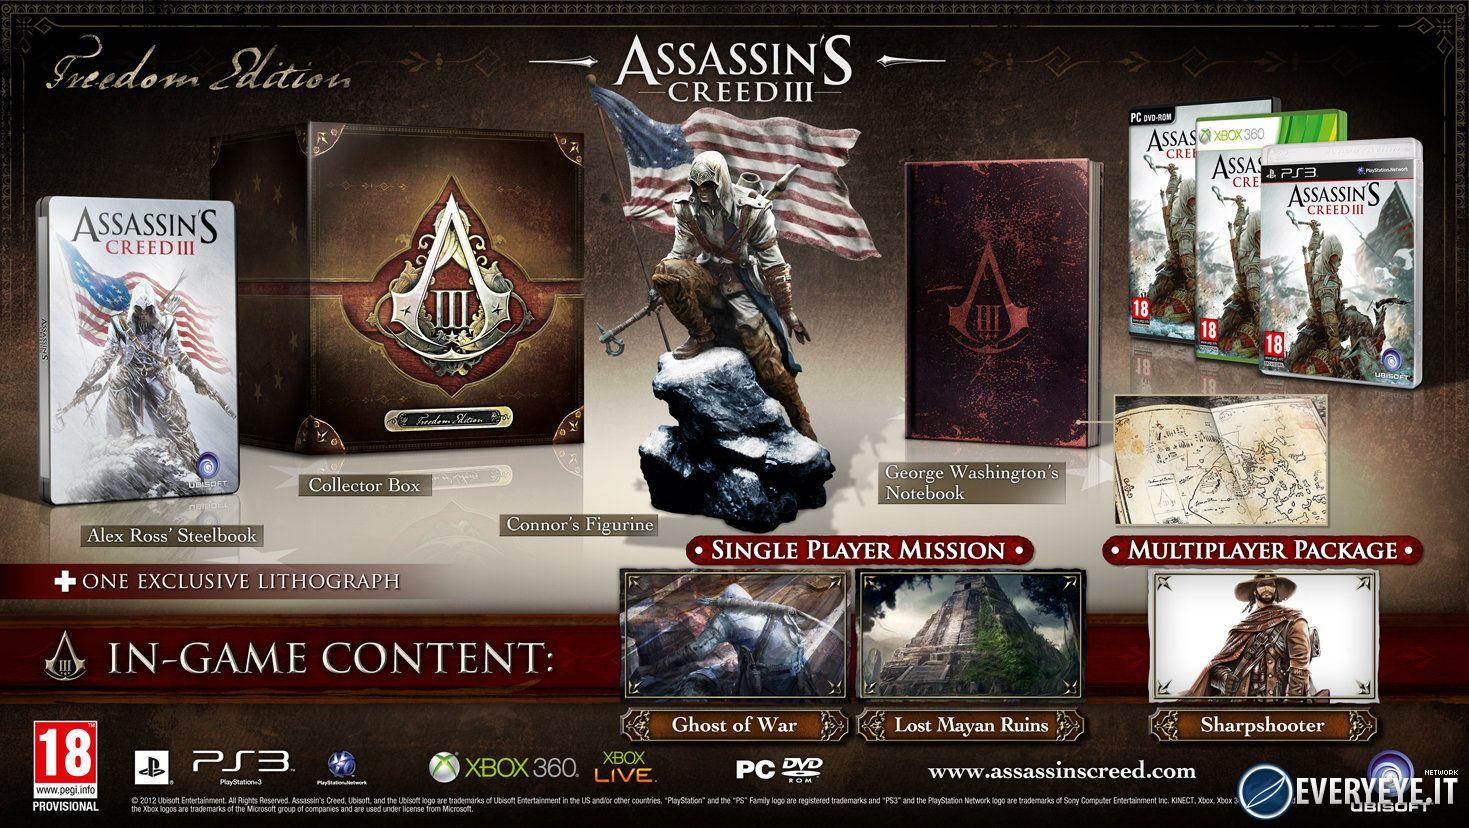 Assassin-s-Creed-3_XBOX360_w_5482.jpg